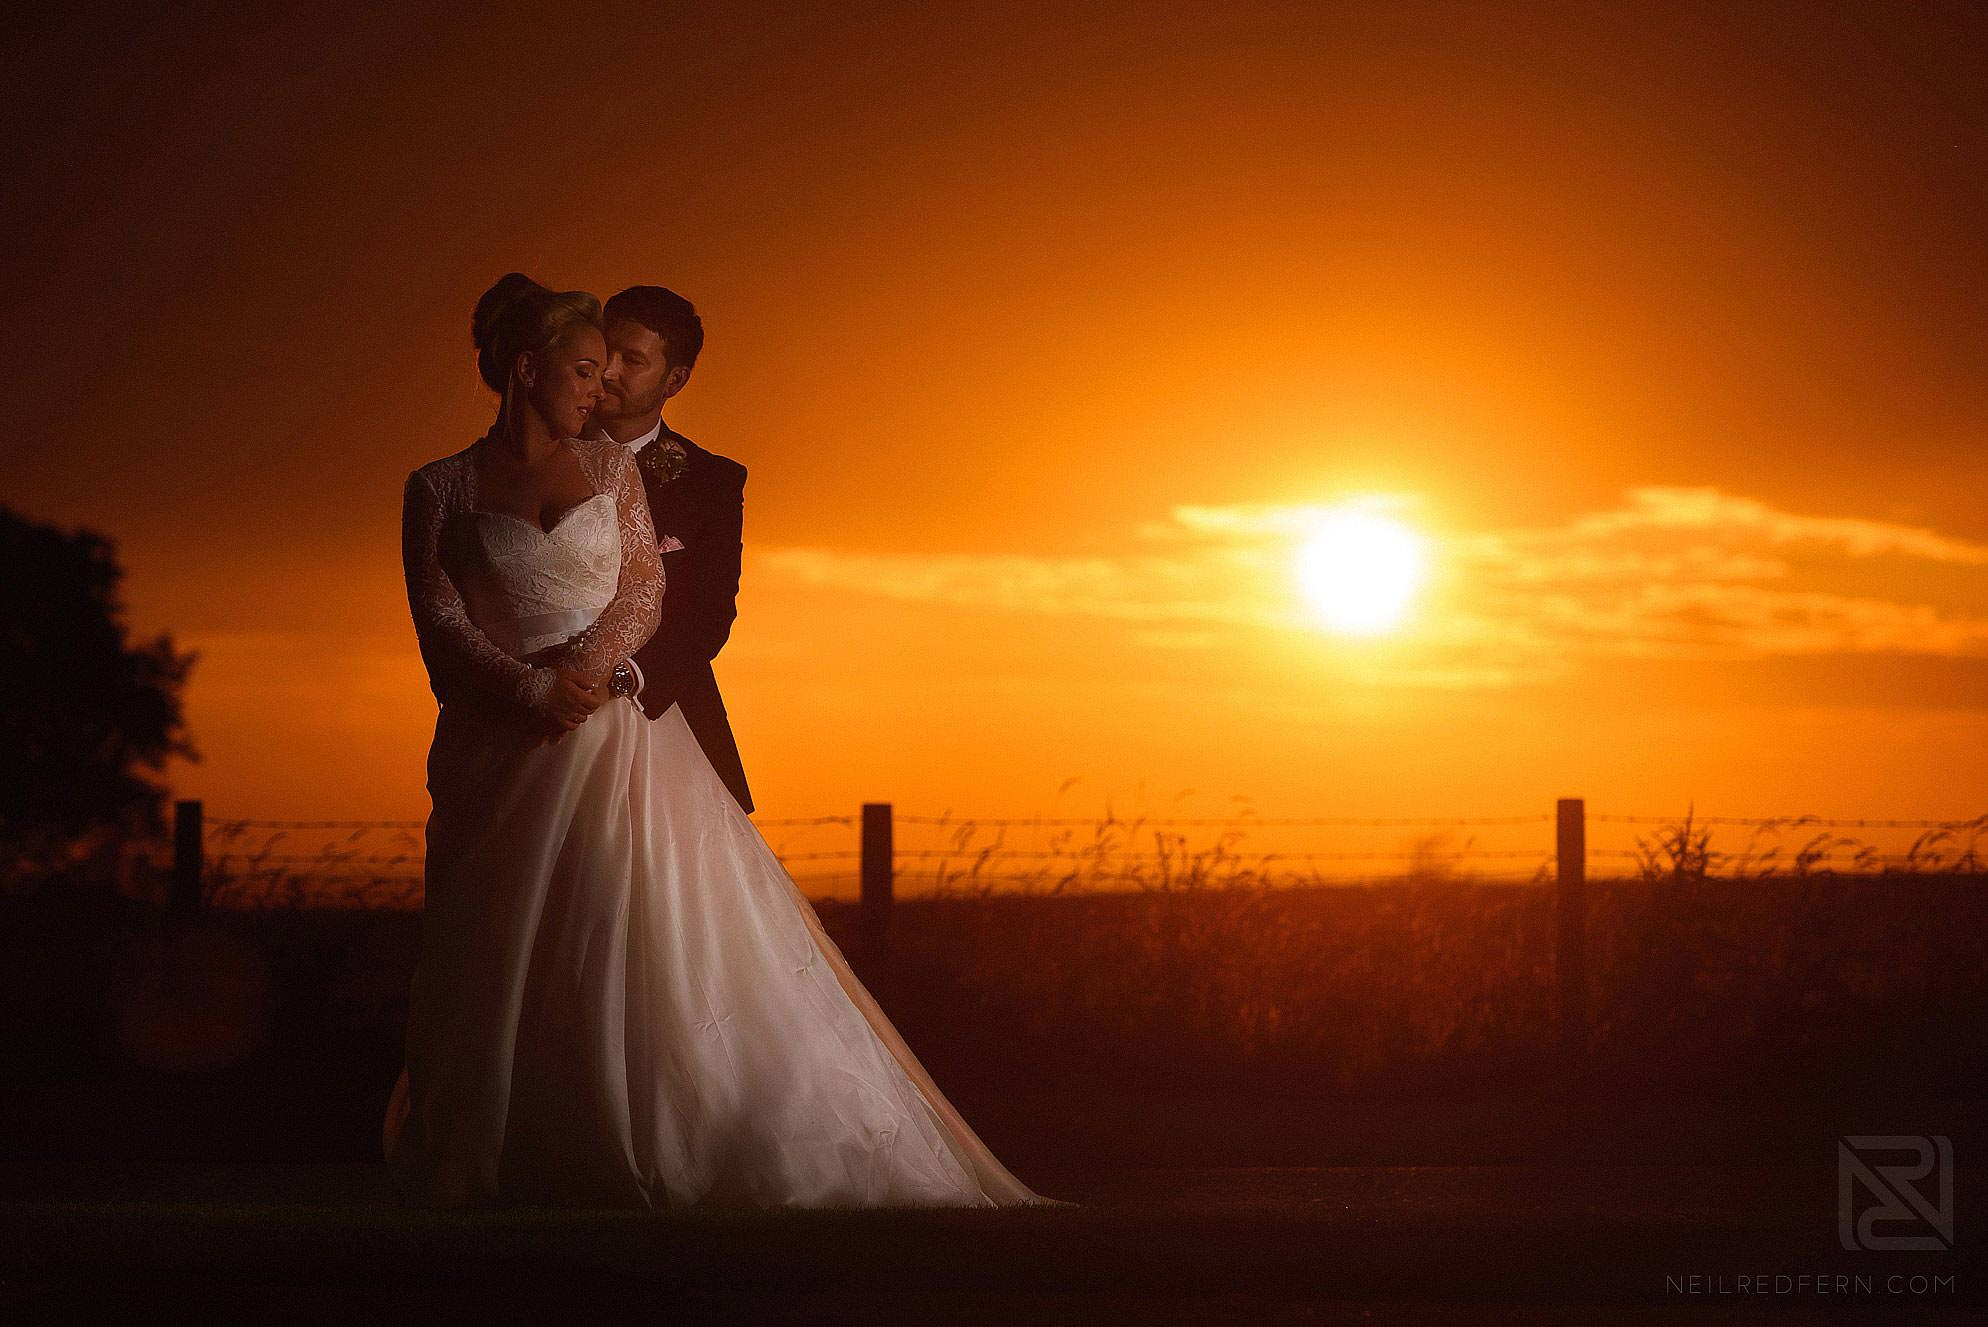 best-wedding-photography-2016-066